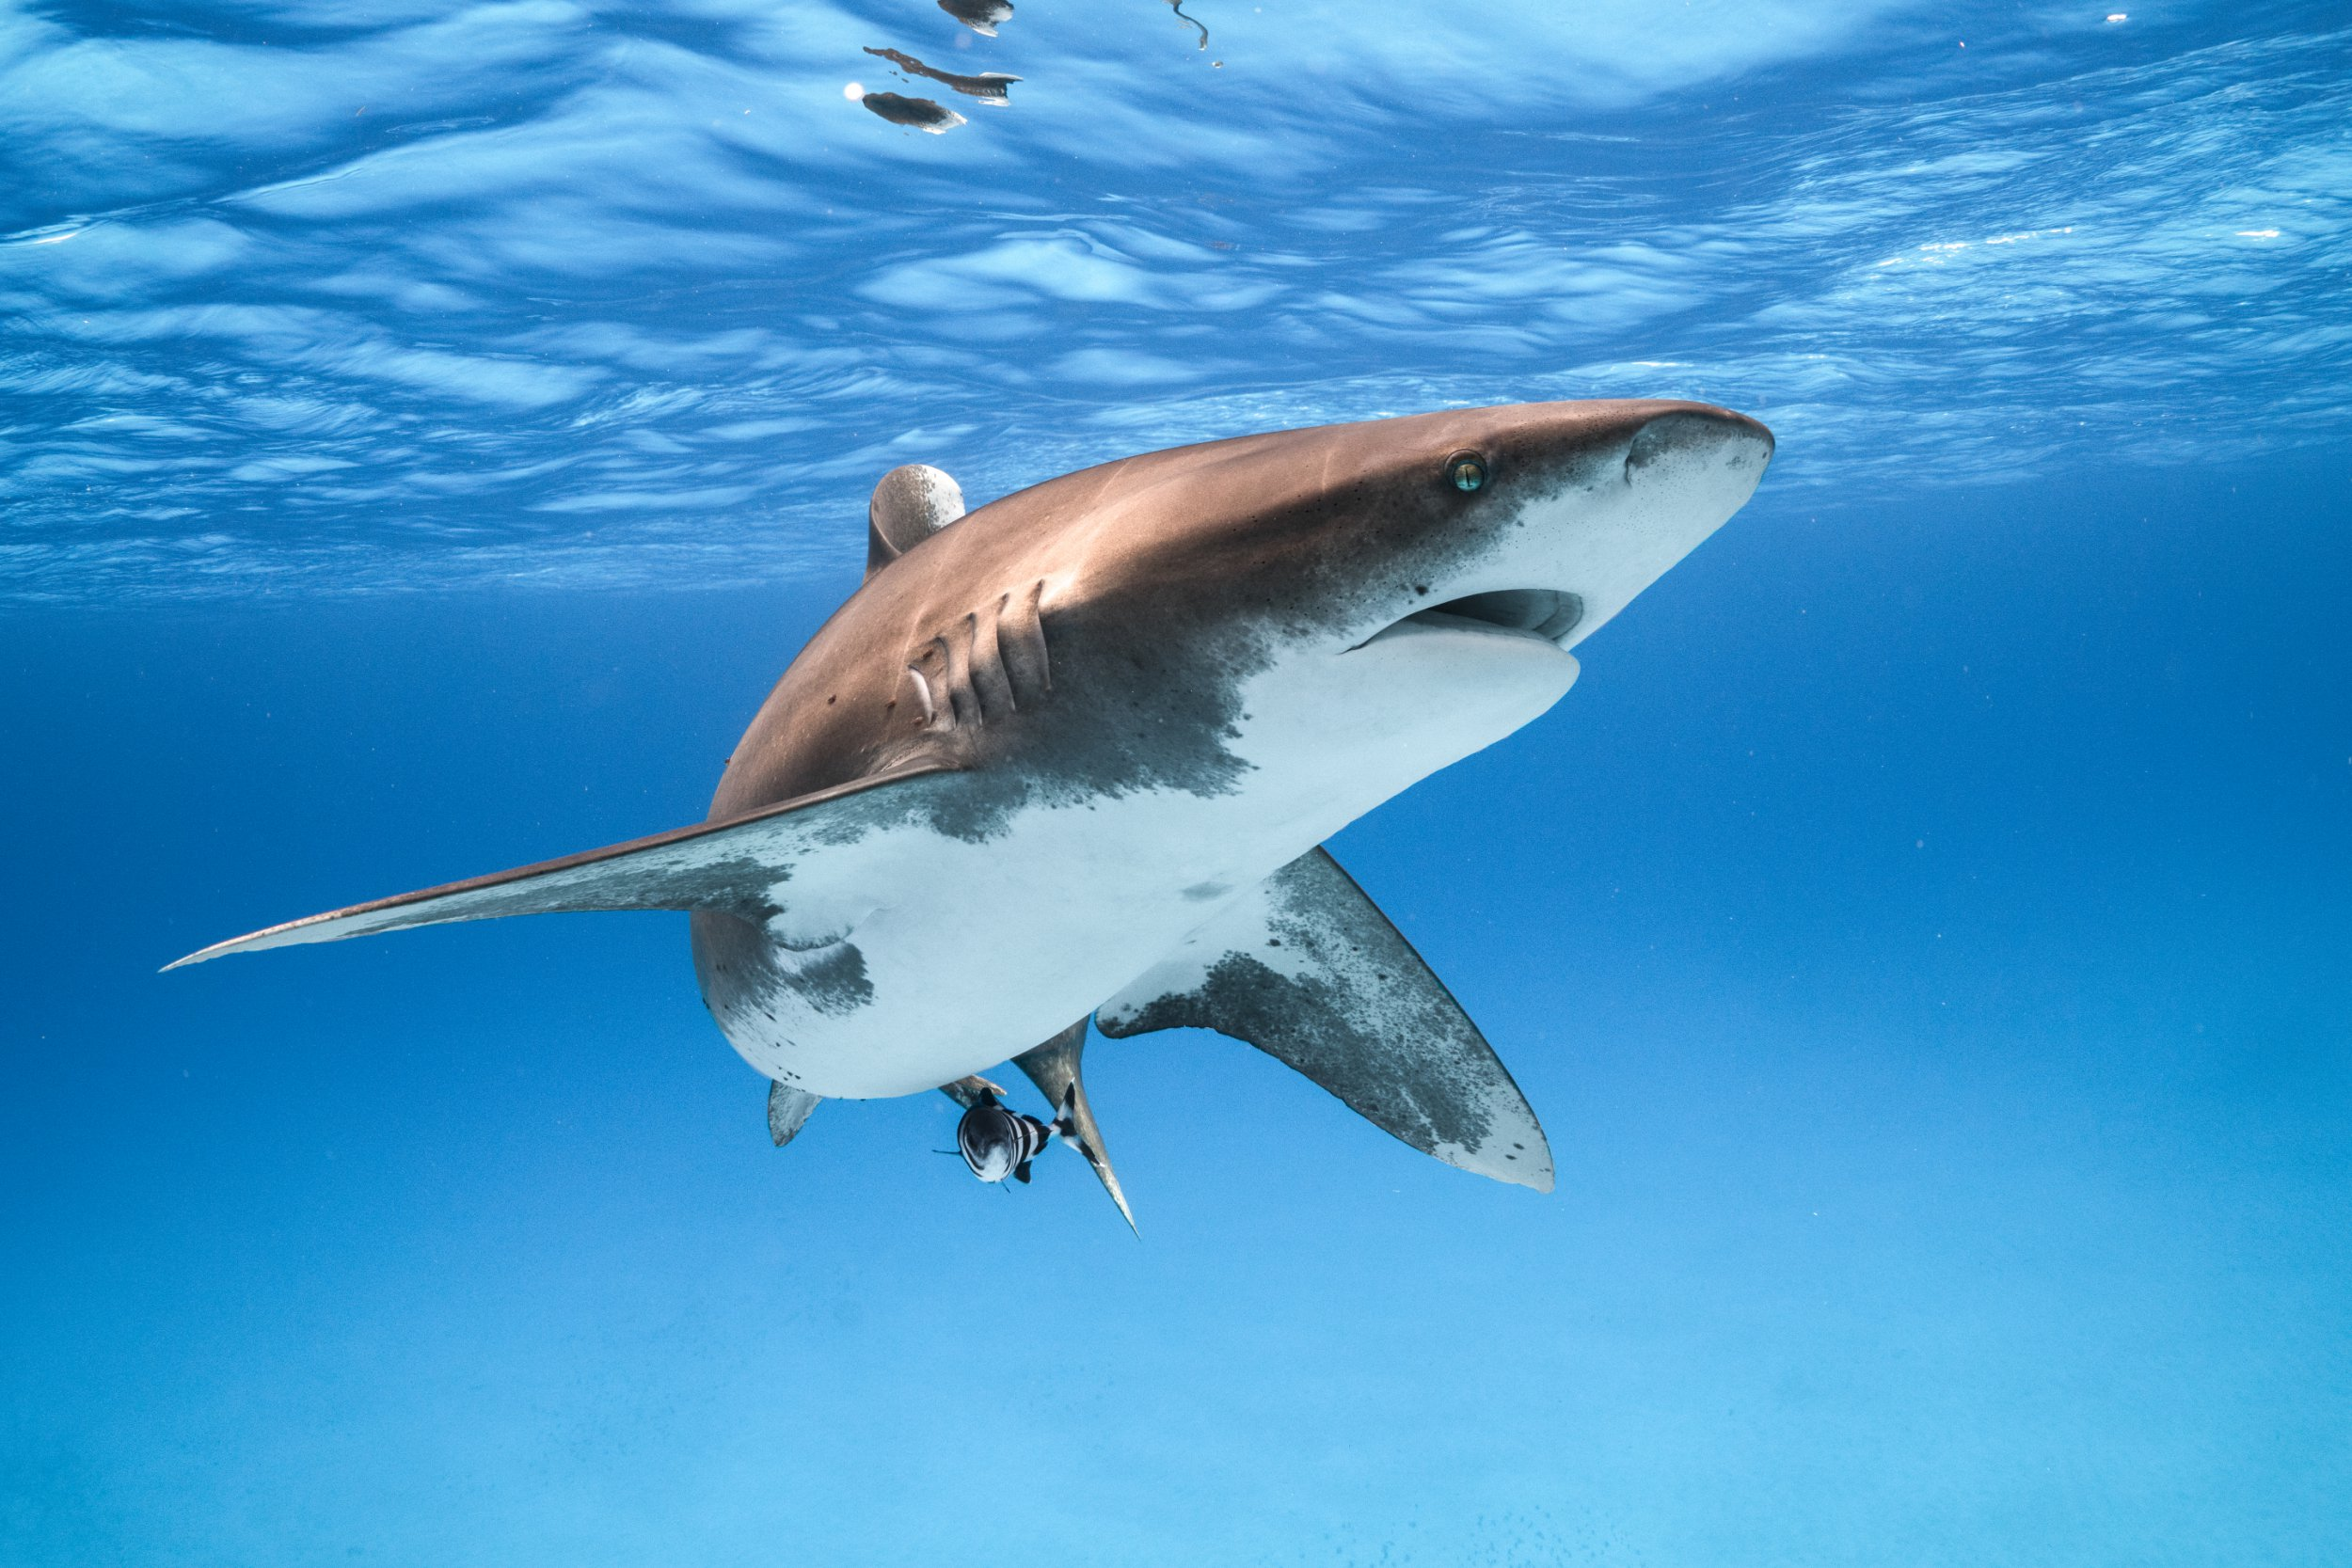 An Oceanic Whitetip Shark makes a close and curious pass.